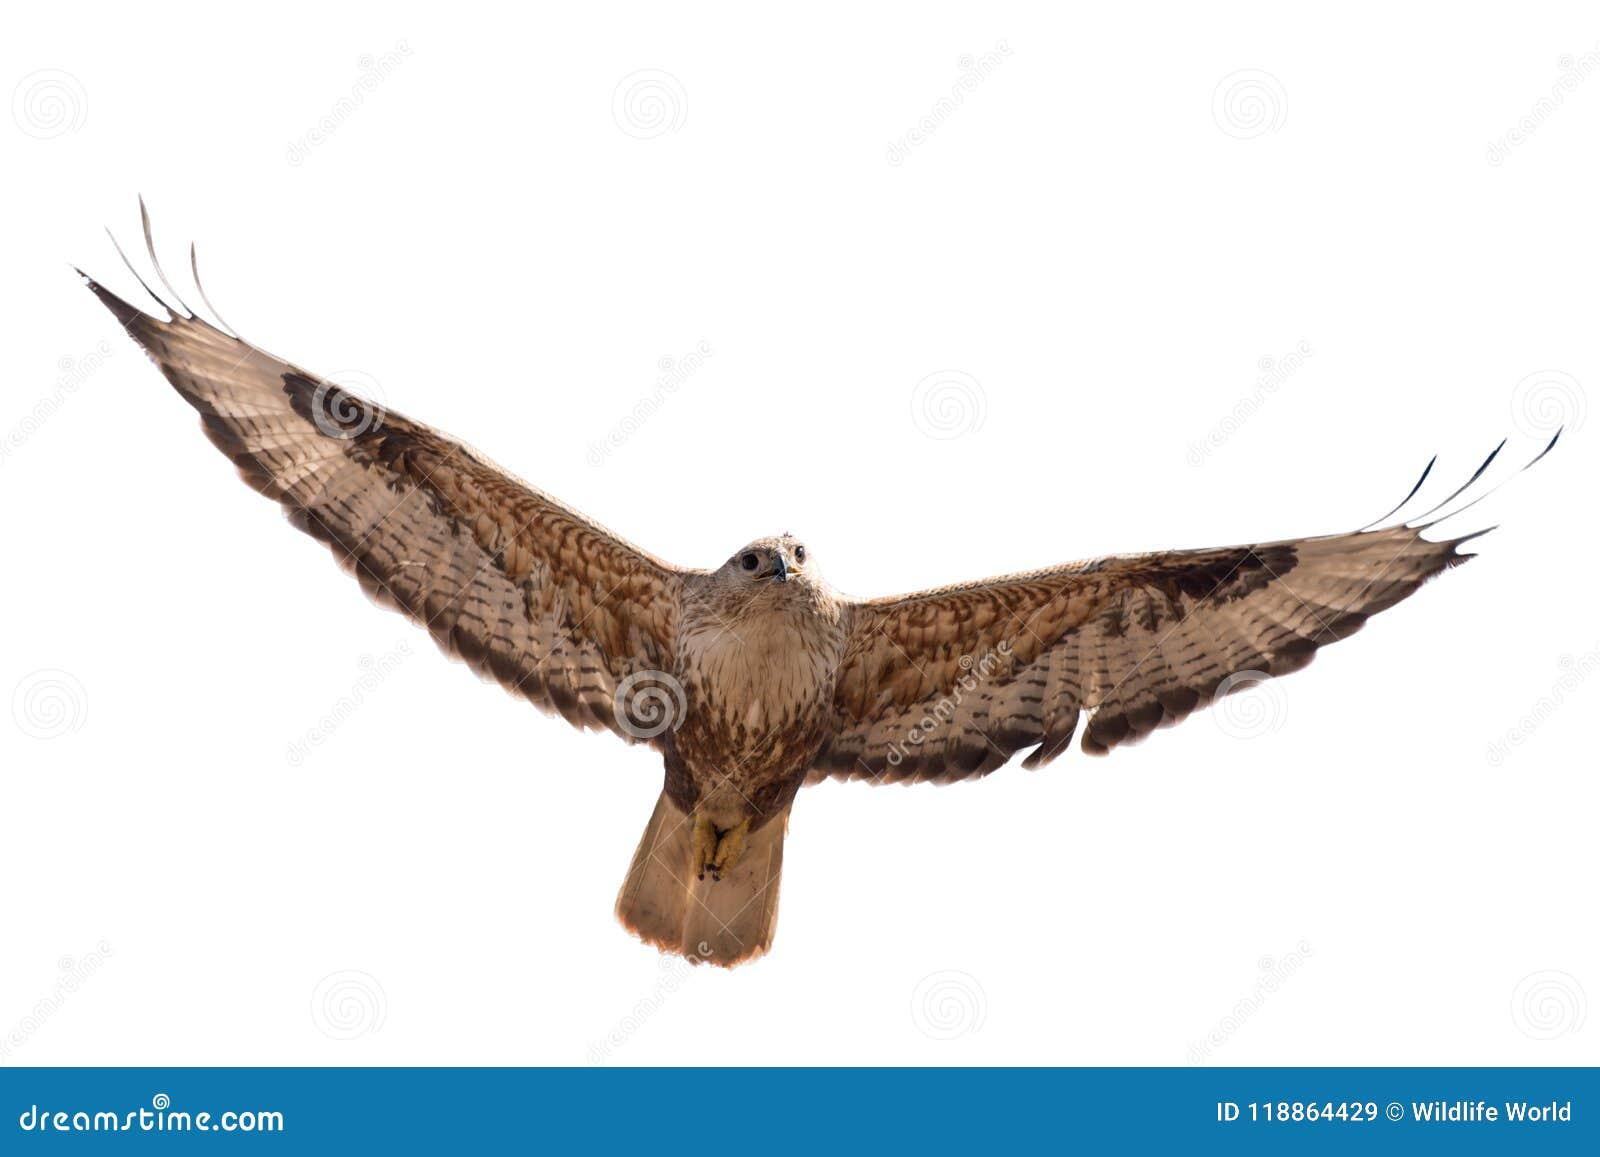 Birds of prey - Long legged buzzard (Buteo rufinus) in flight. Isolated on white